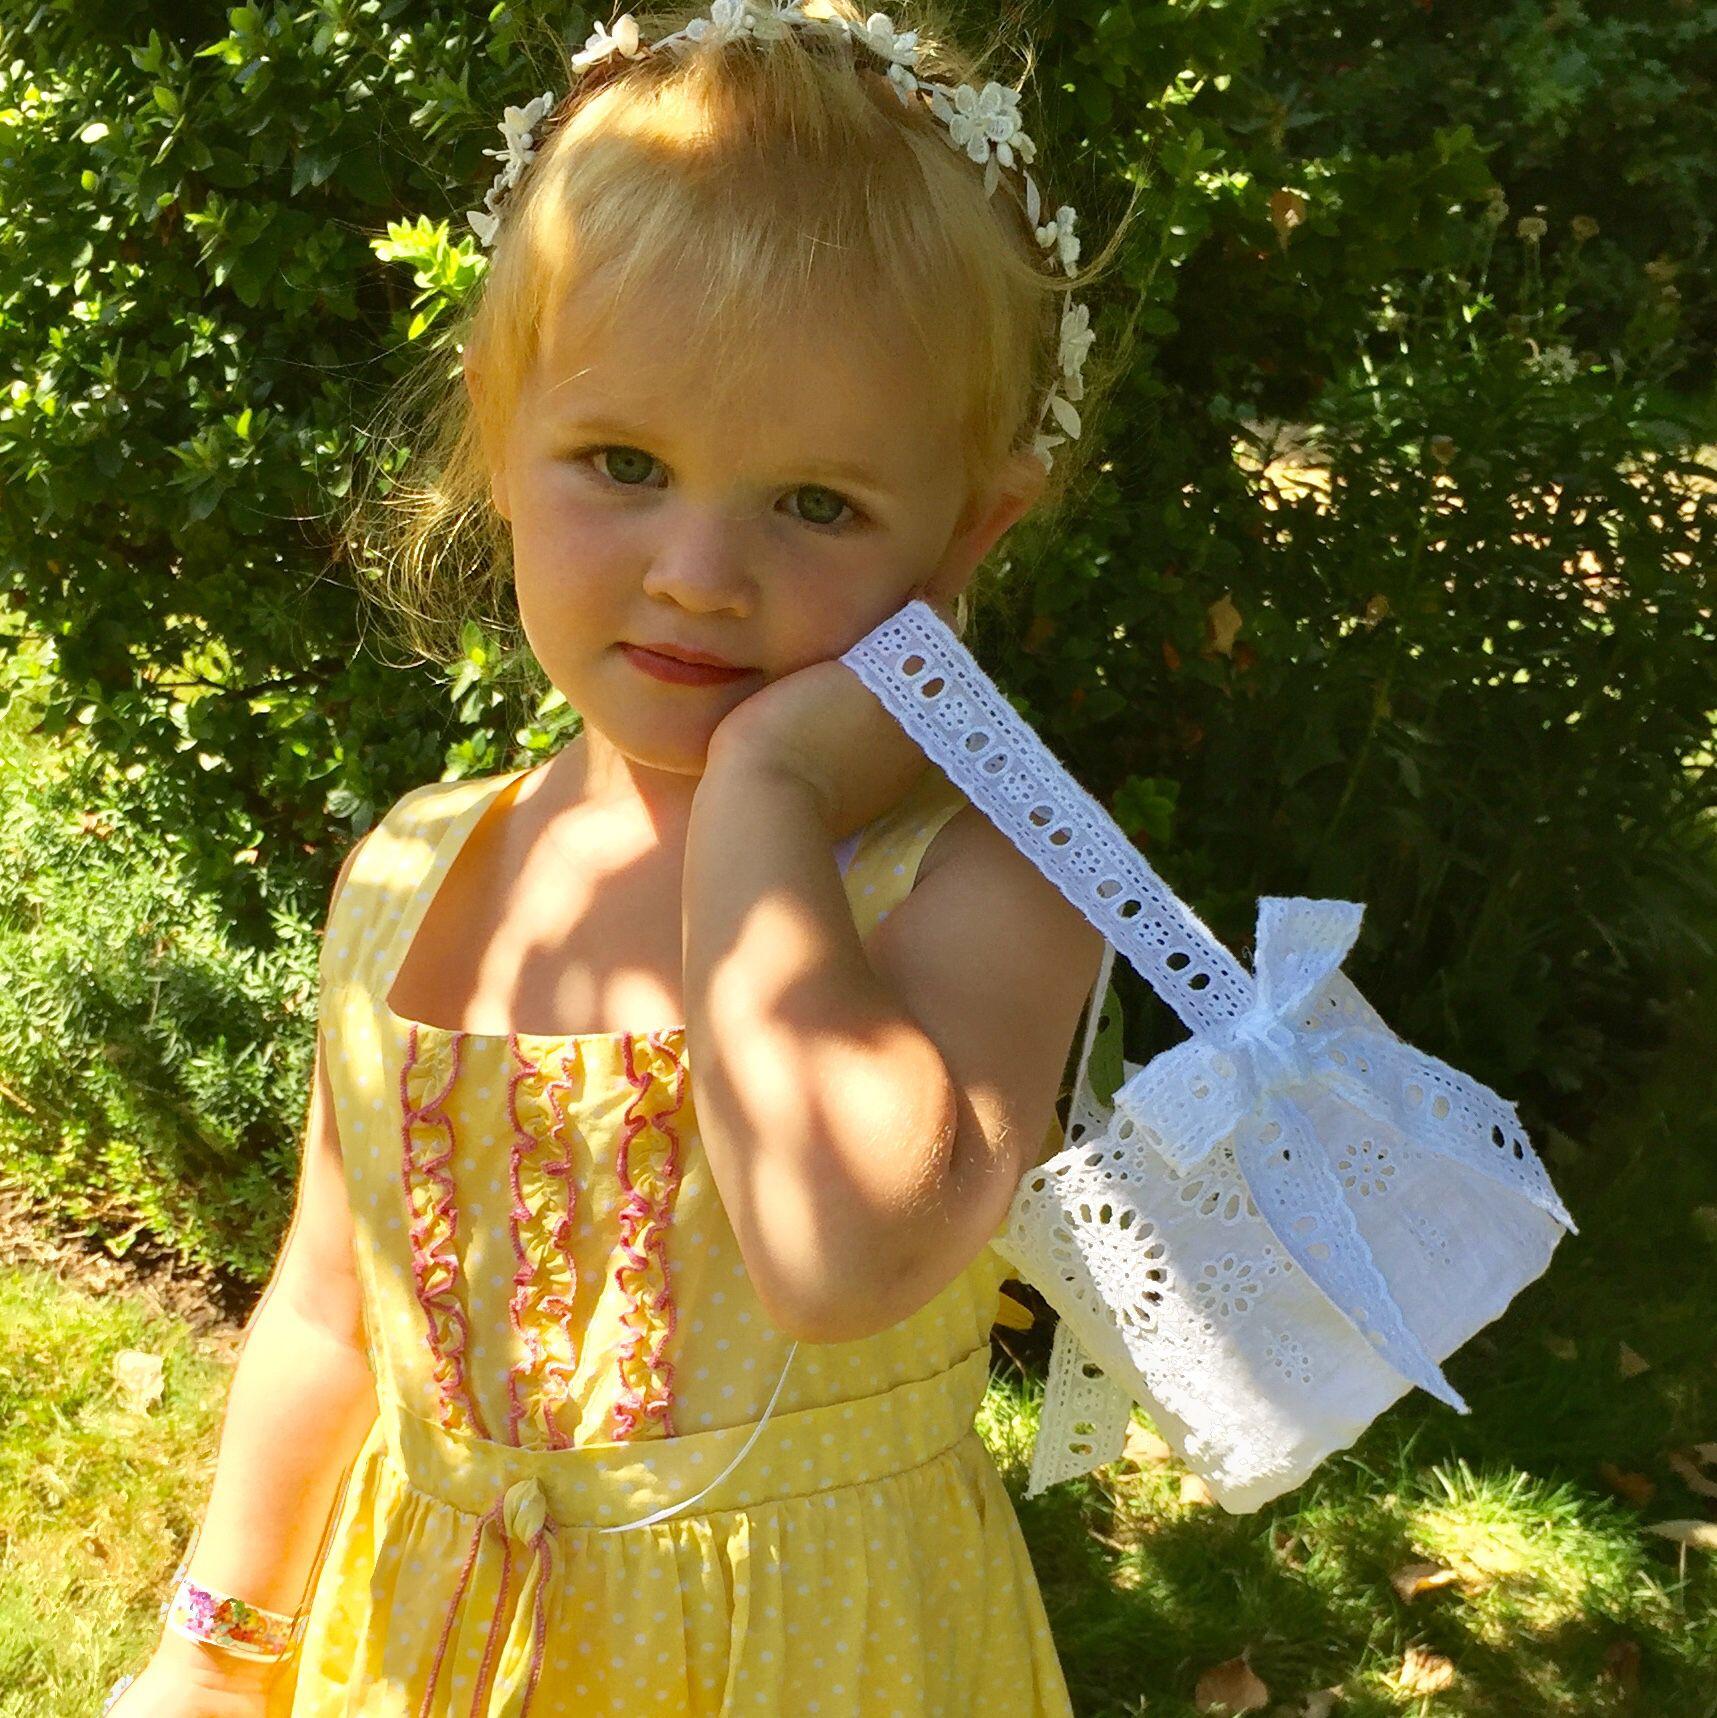 A Pretty Little Basket For Your Pretty Little Flower Girlhandmade